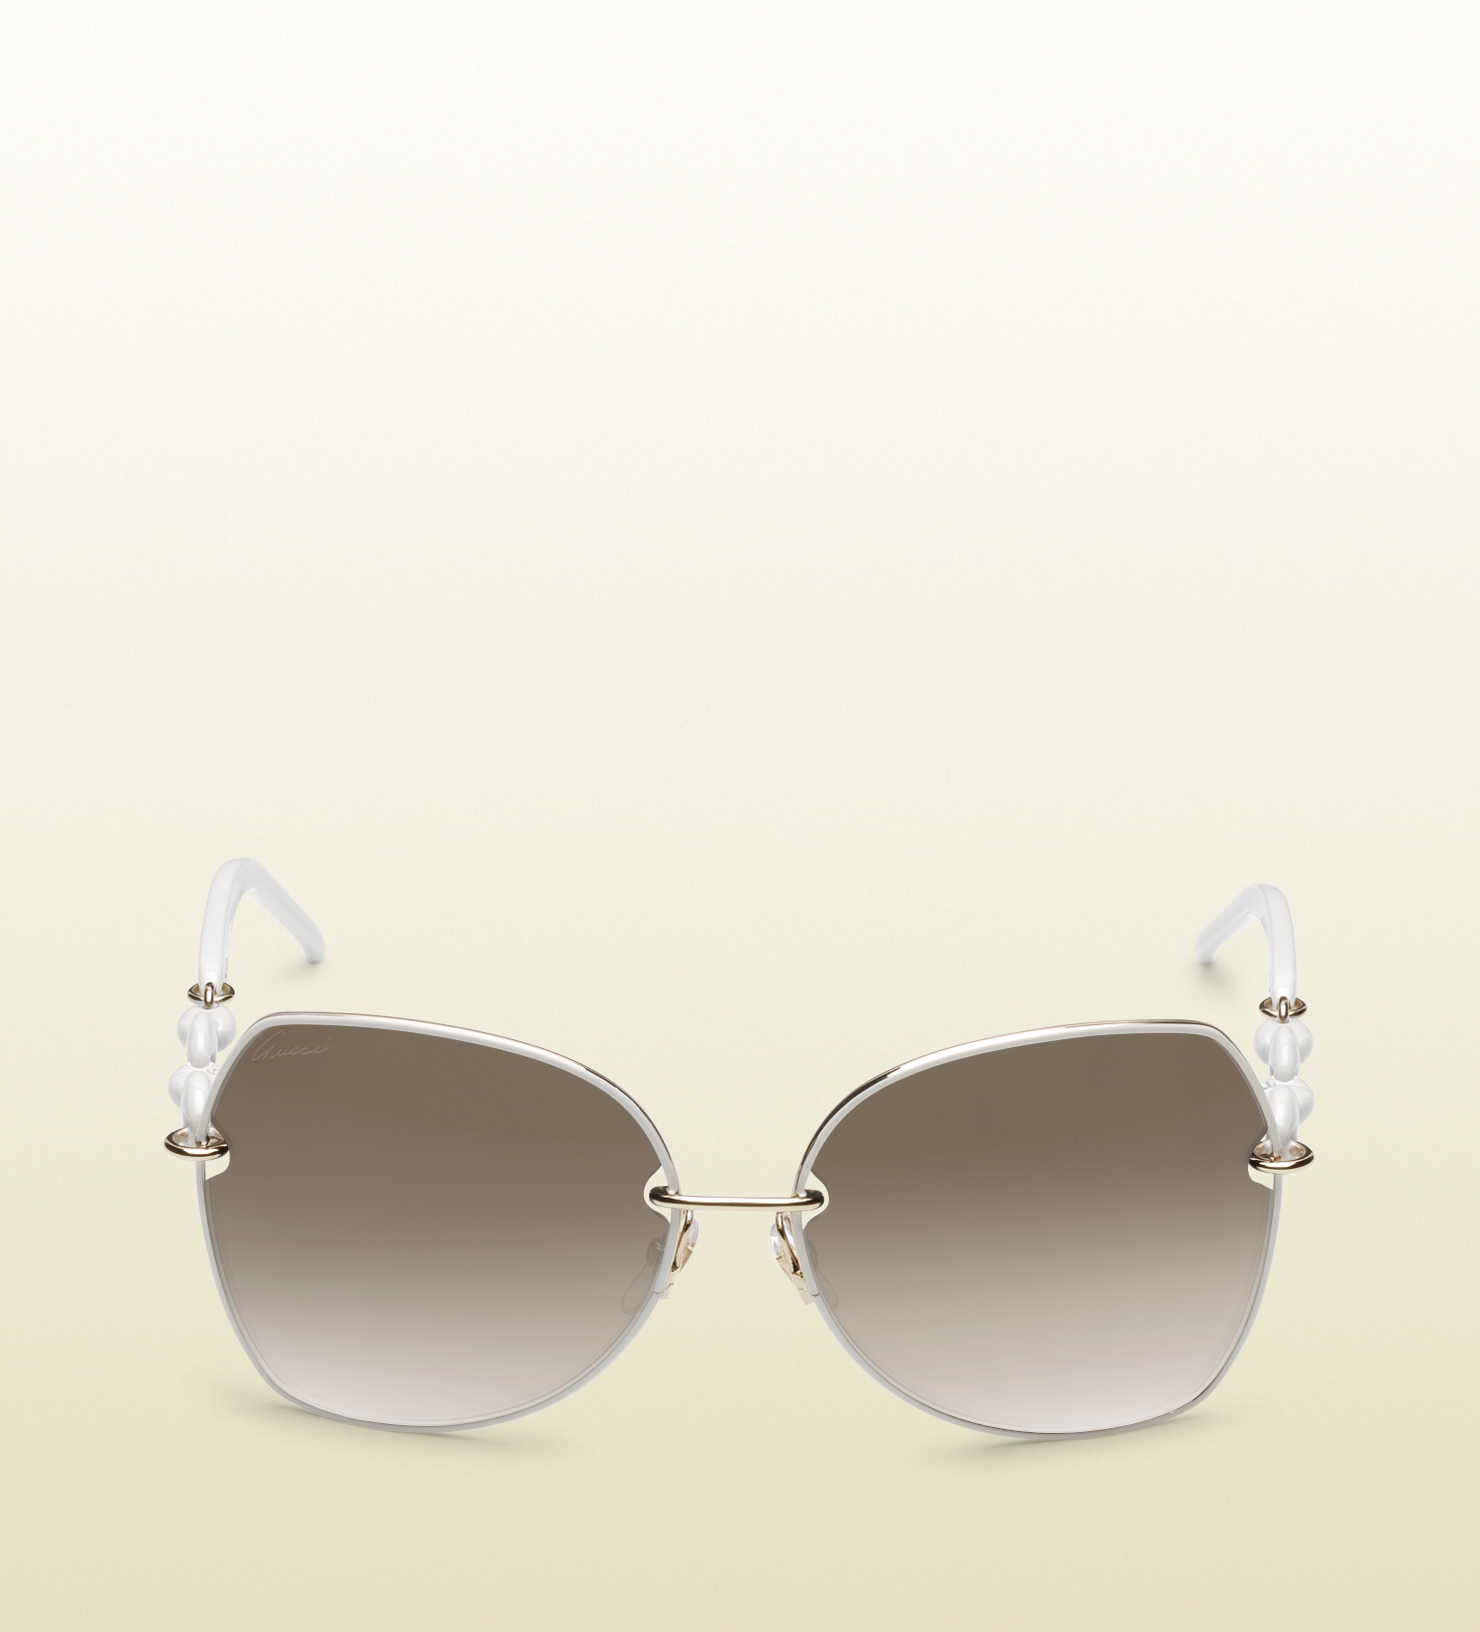 fd7eba5d74b Gucci Medium Oval Frame Sunglasses with Plastic Marina Chain Temples ...